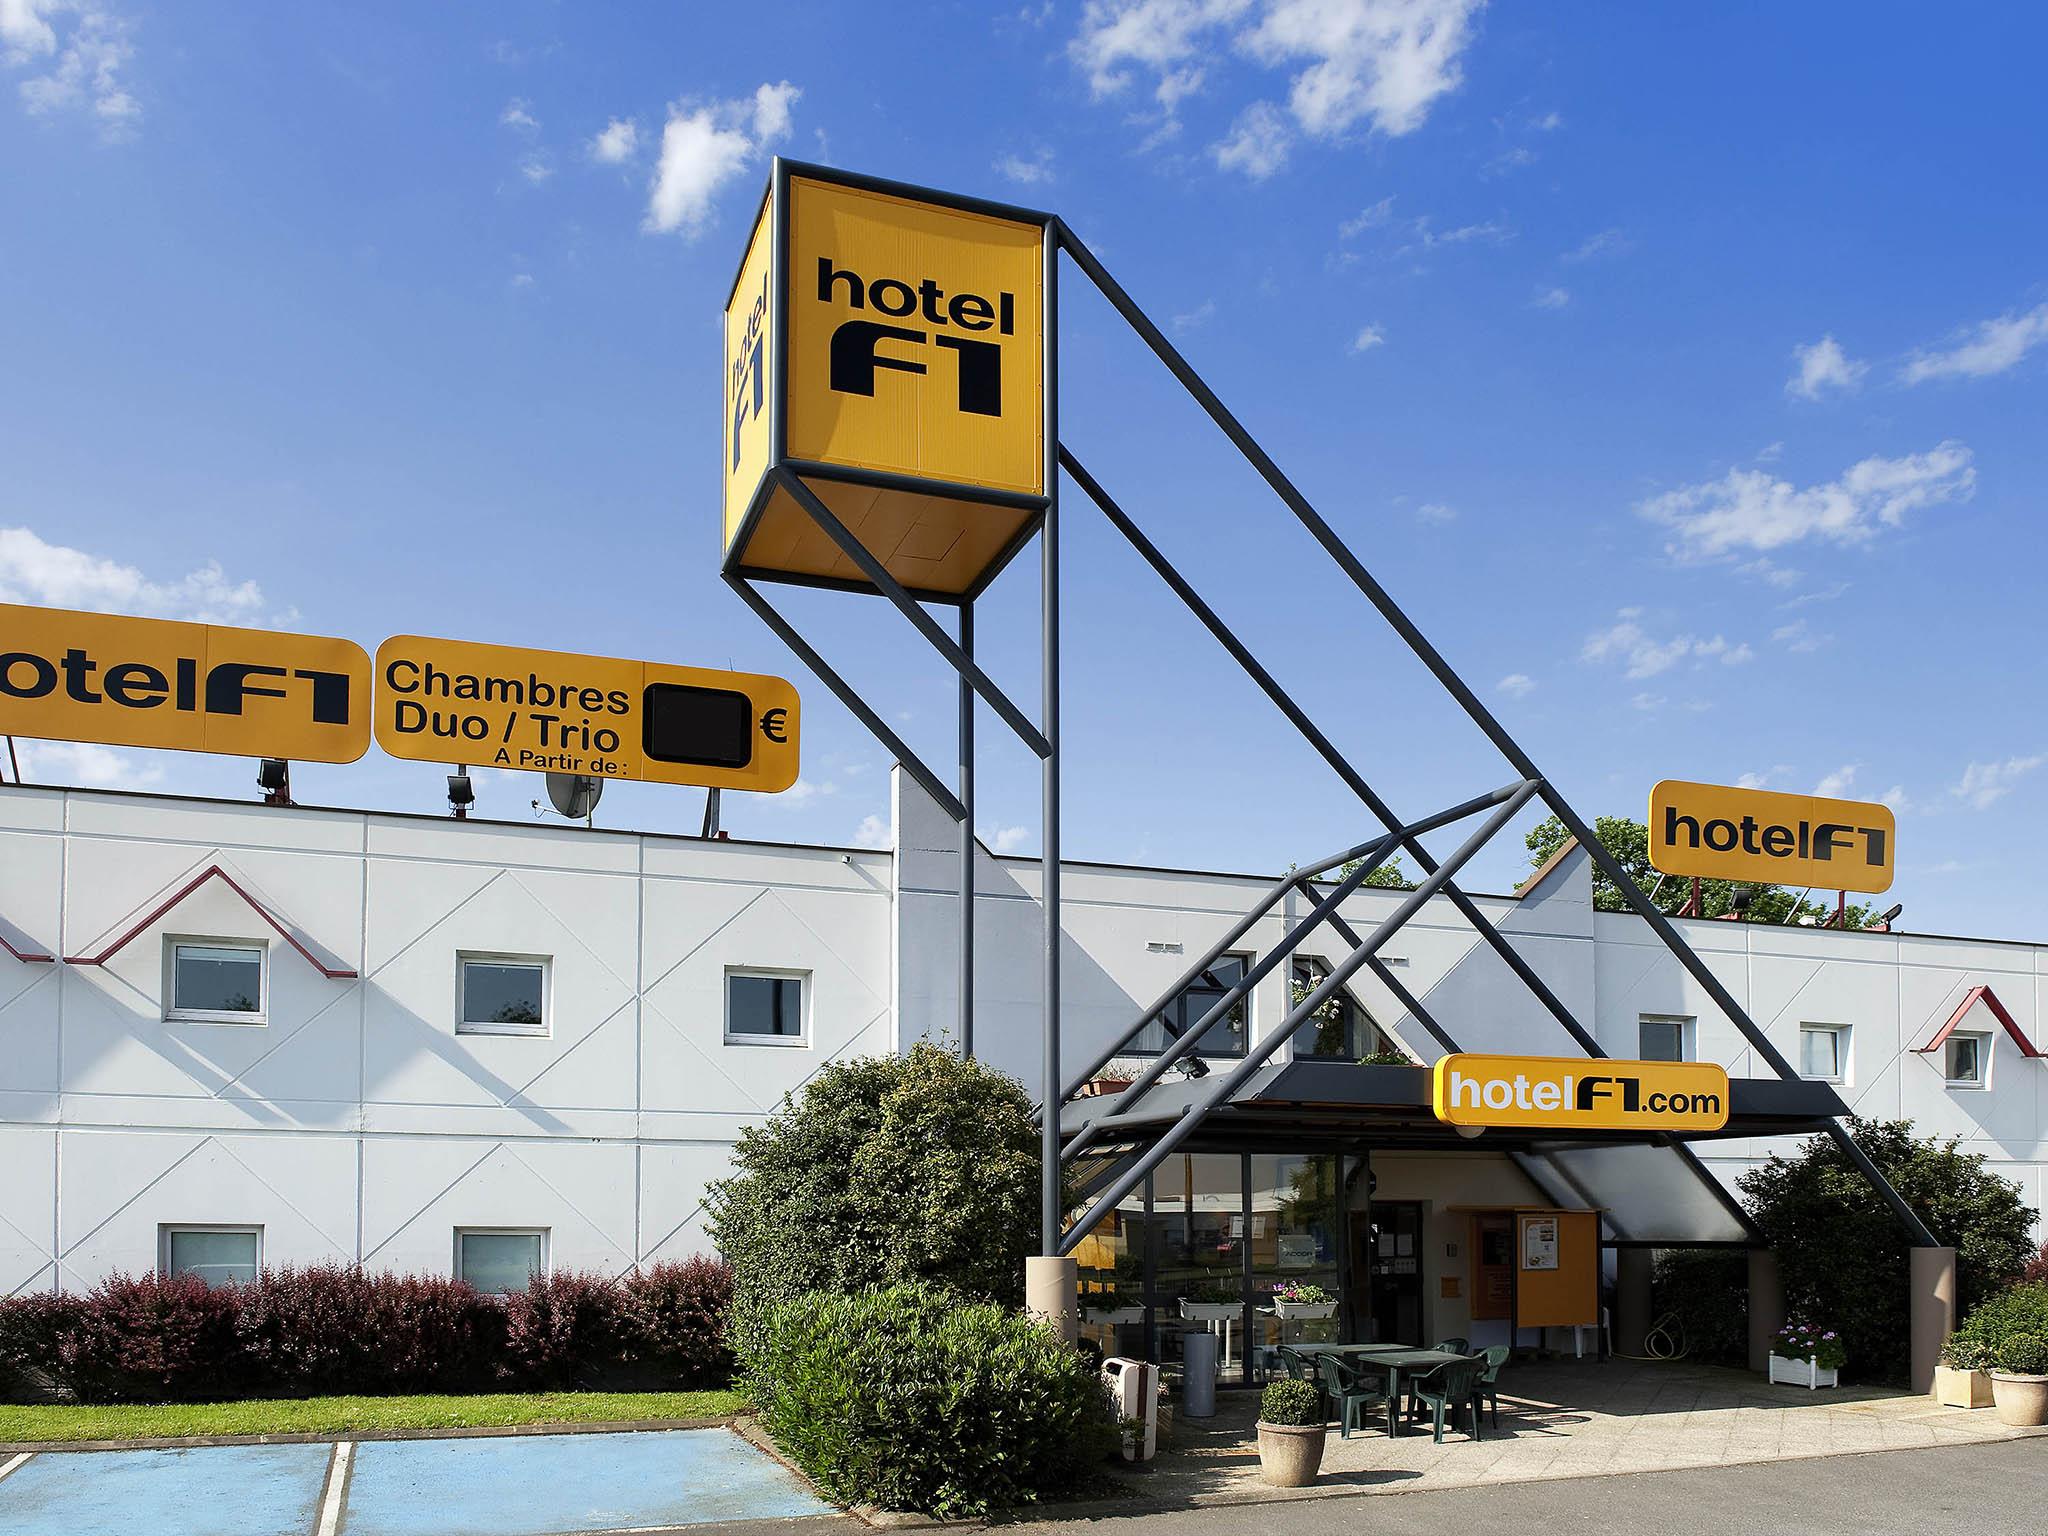 Otel – hotelF1 Périgueux Boulazac